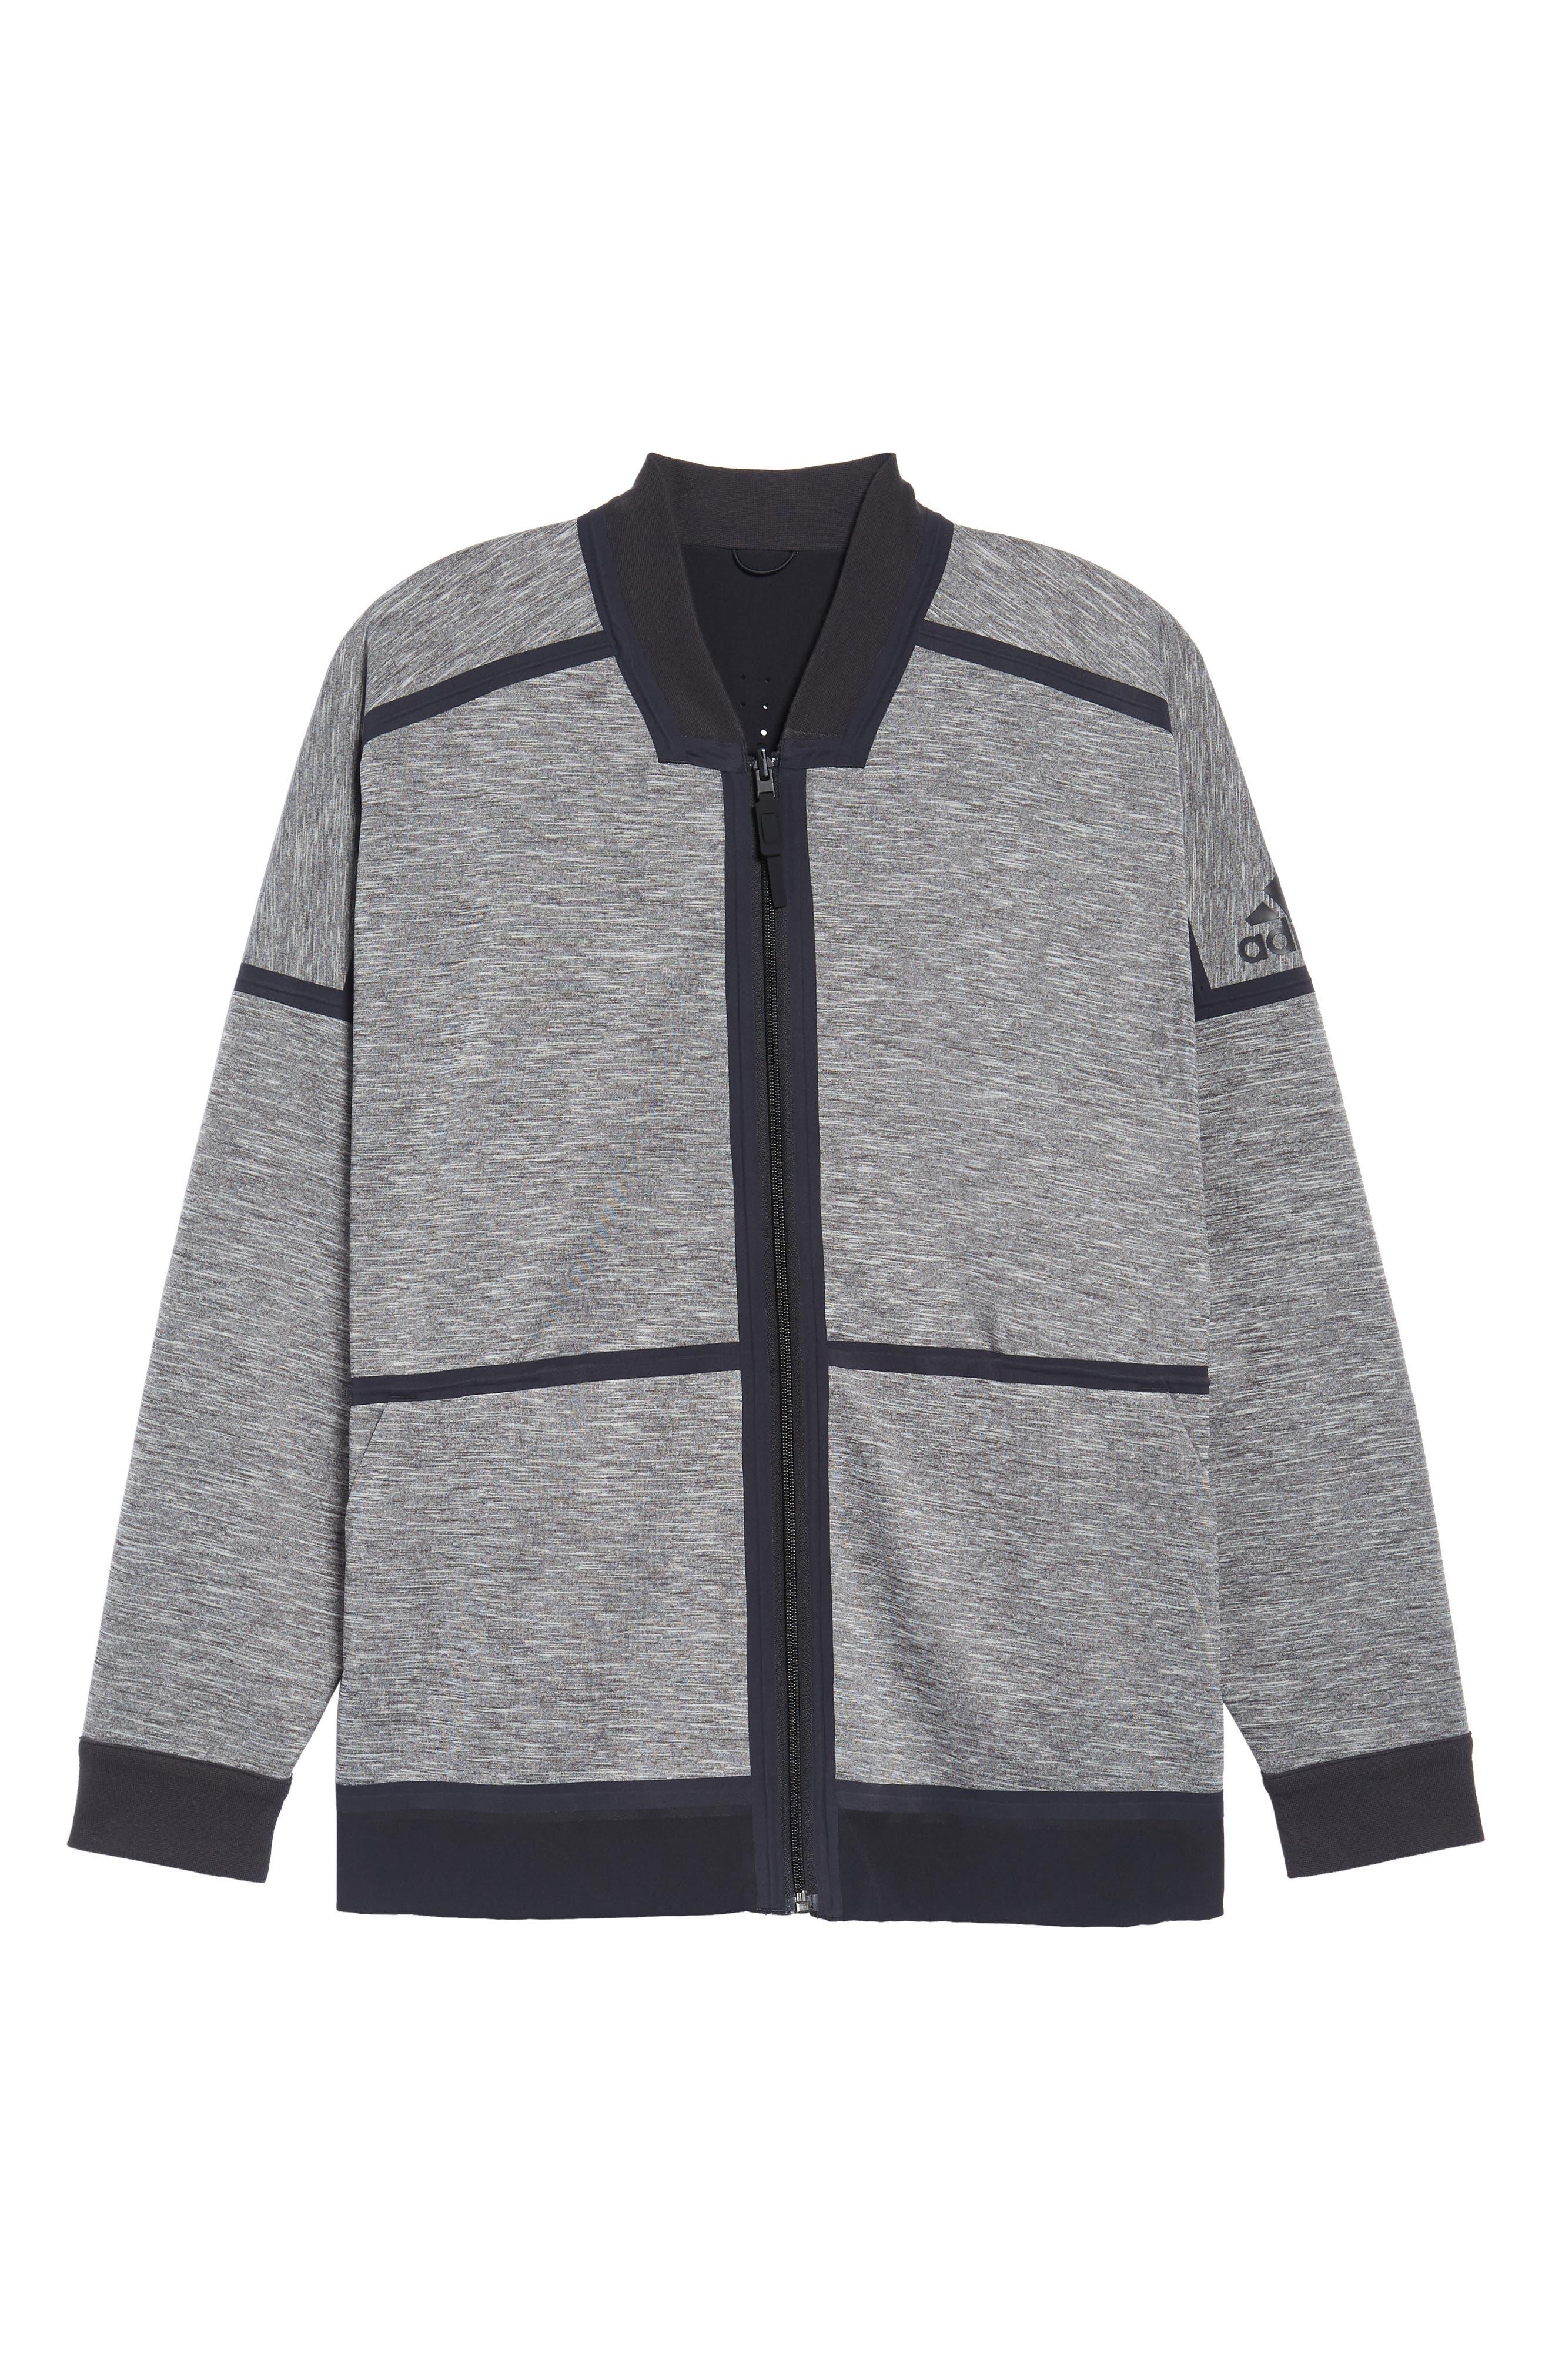 Z.N.E. Reversible Ventilated Jacket,                             Alternate thumbnail 3, color,                             Black / Storm Heather/ Mgh